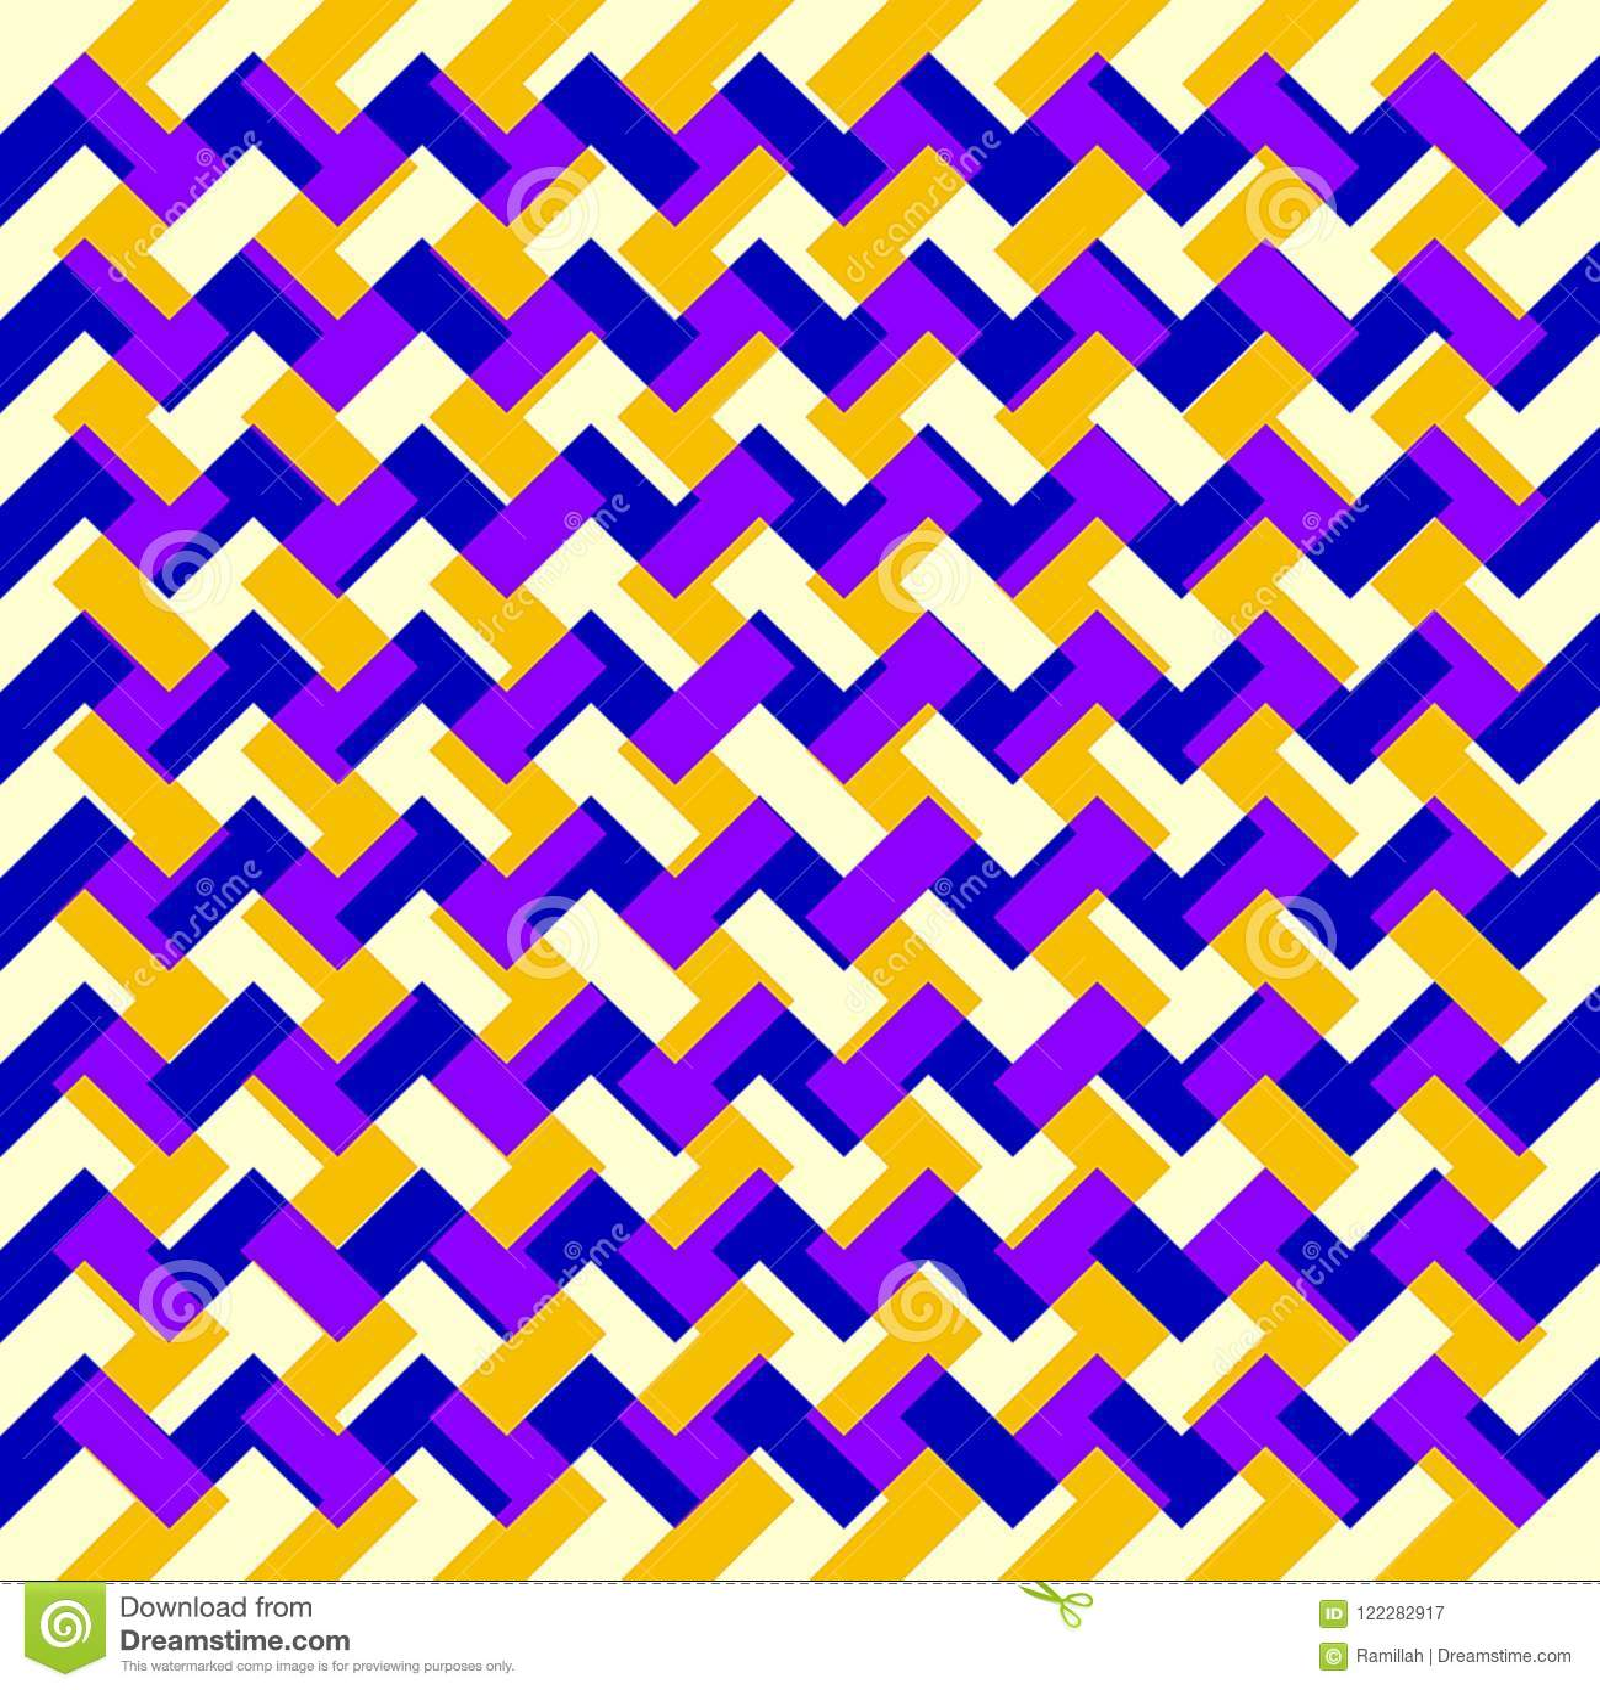 Digital-Malerei-schöner abstrakter bunter gewellter dreieckiger Zickzack-Beschaffenheits-Schicht-Muster-Hintergrund